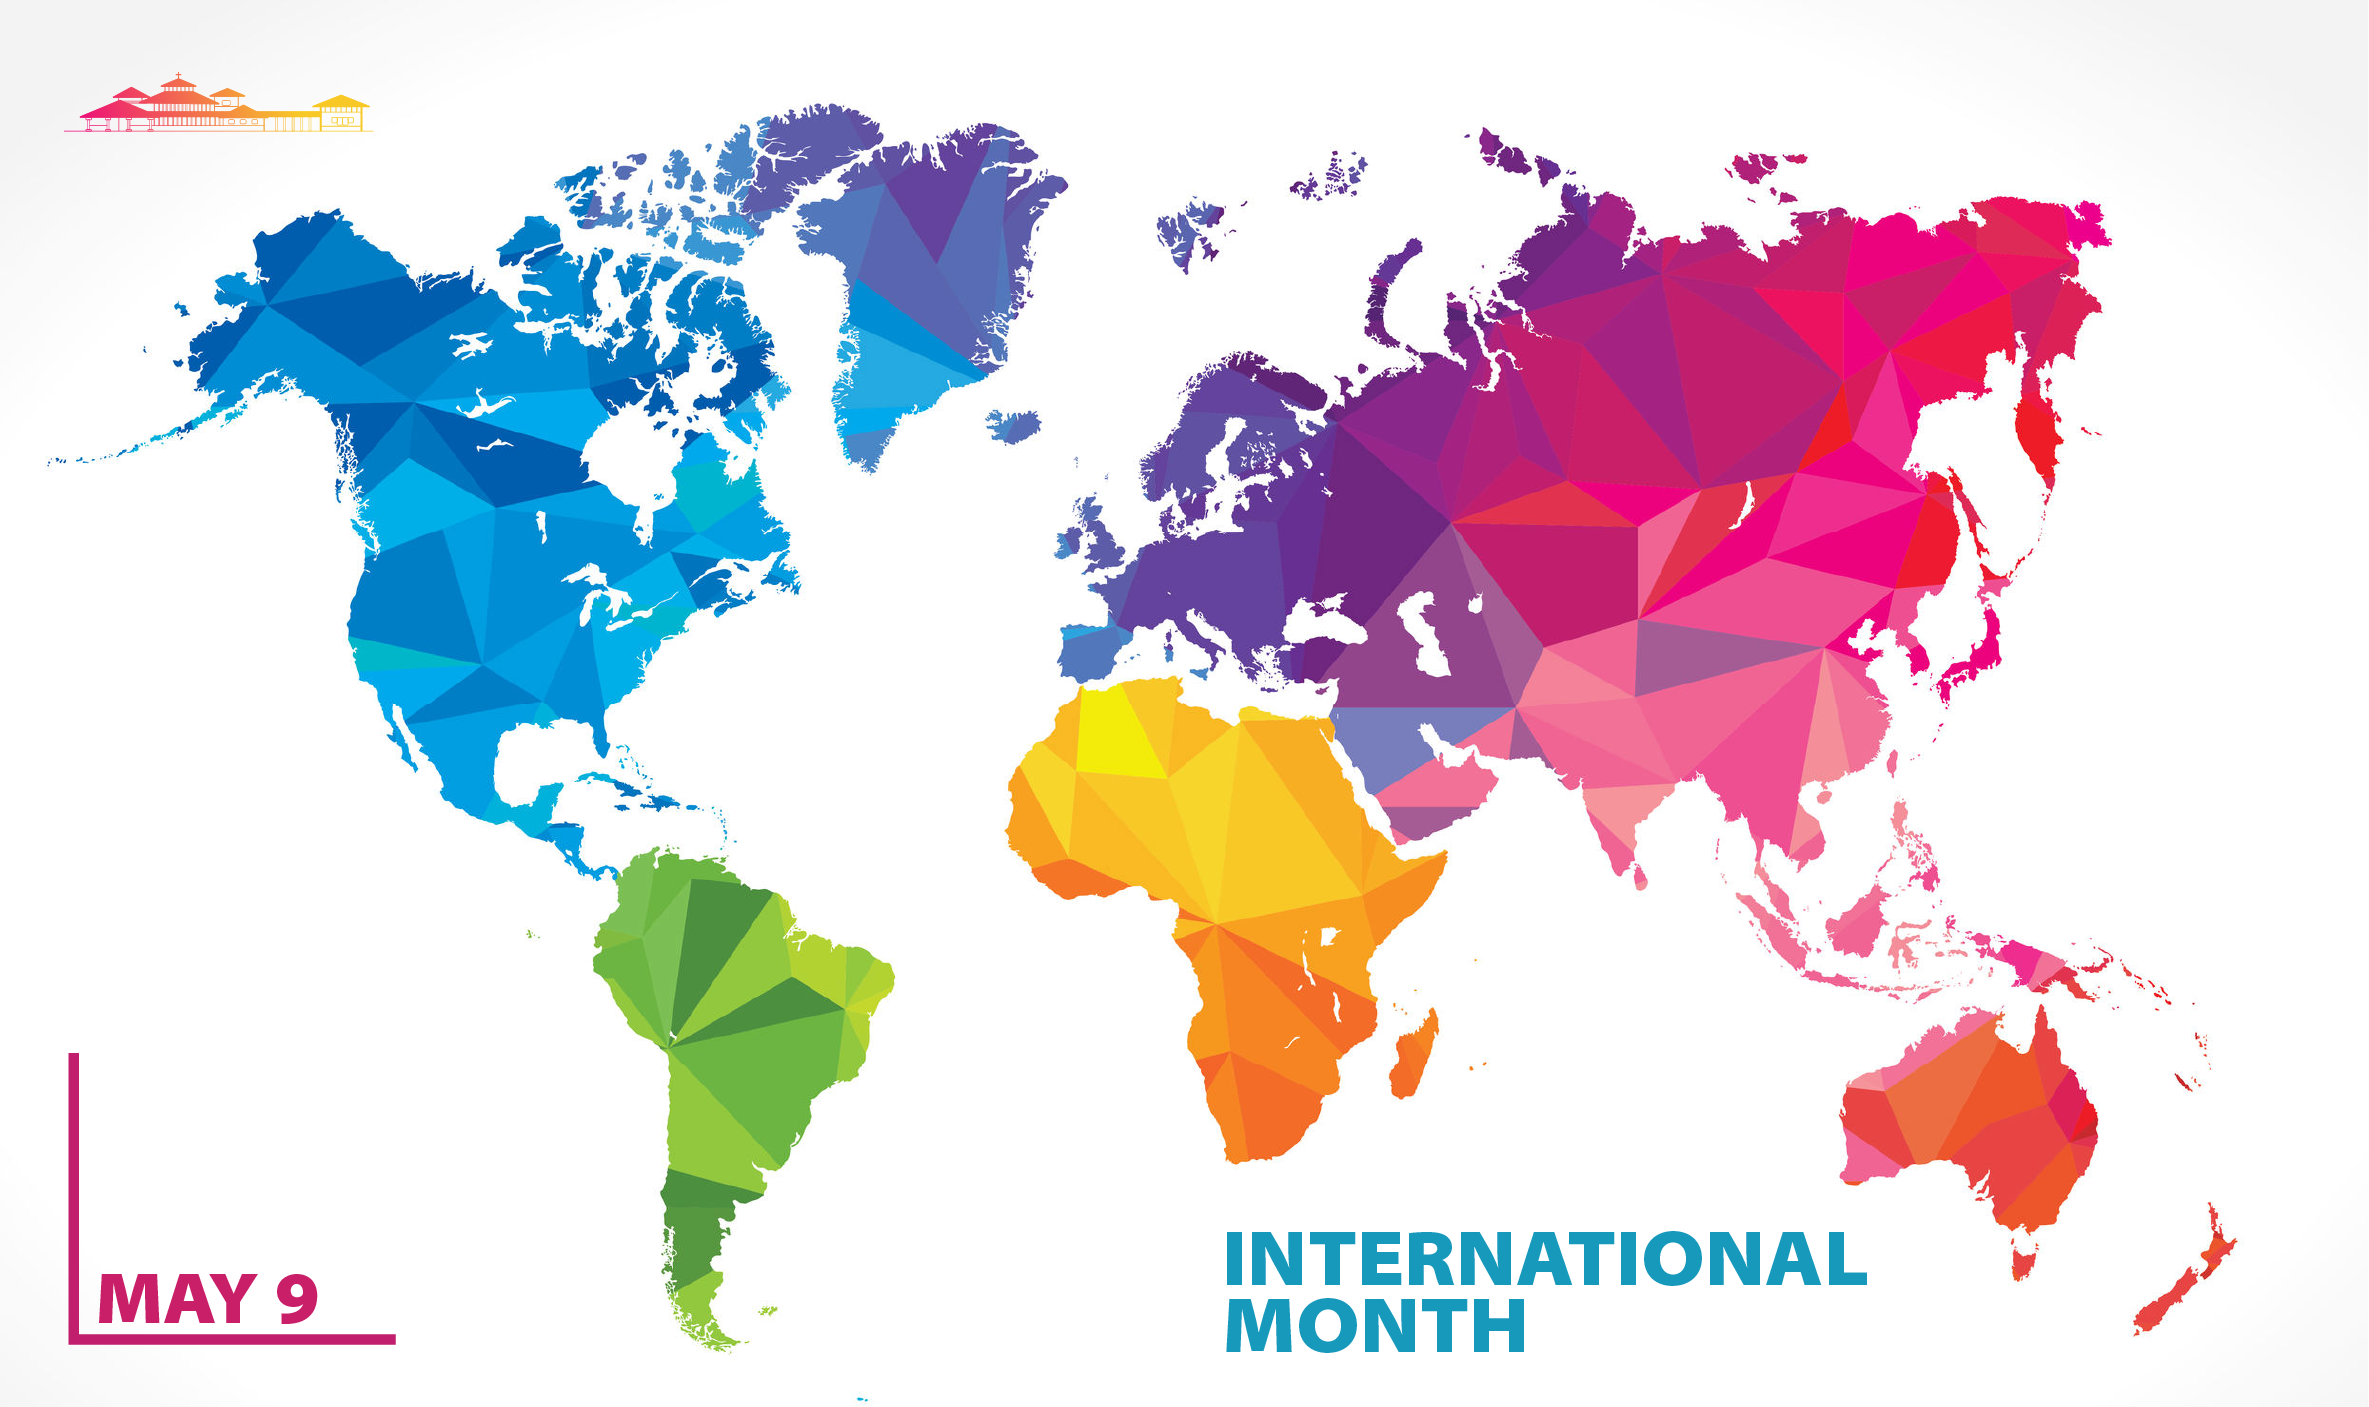 International Month